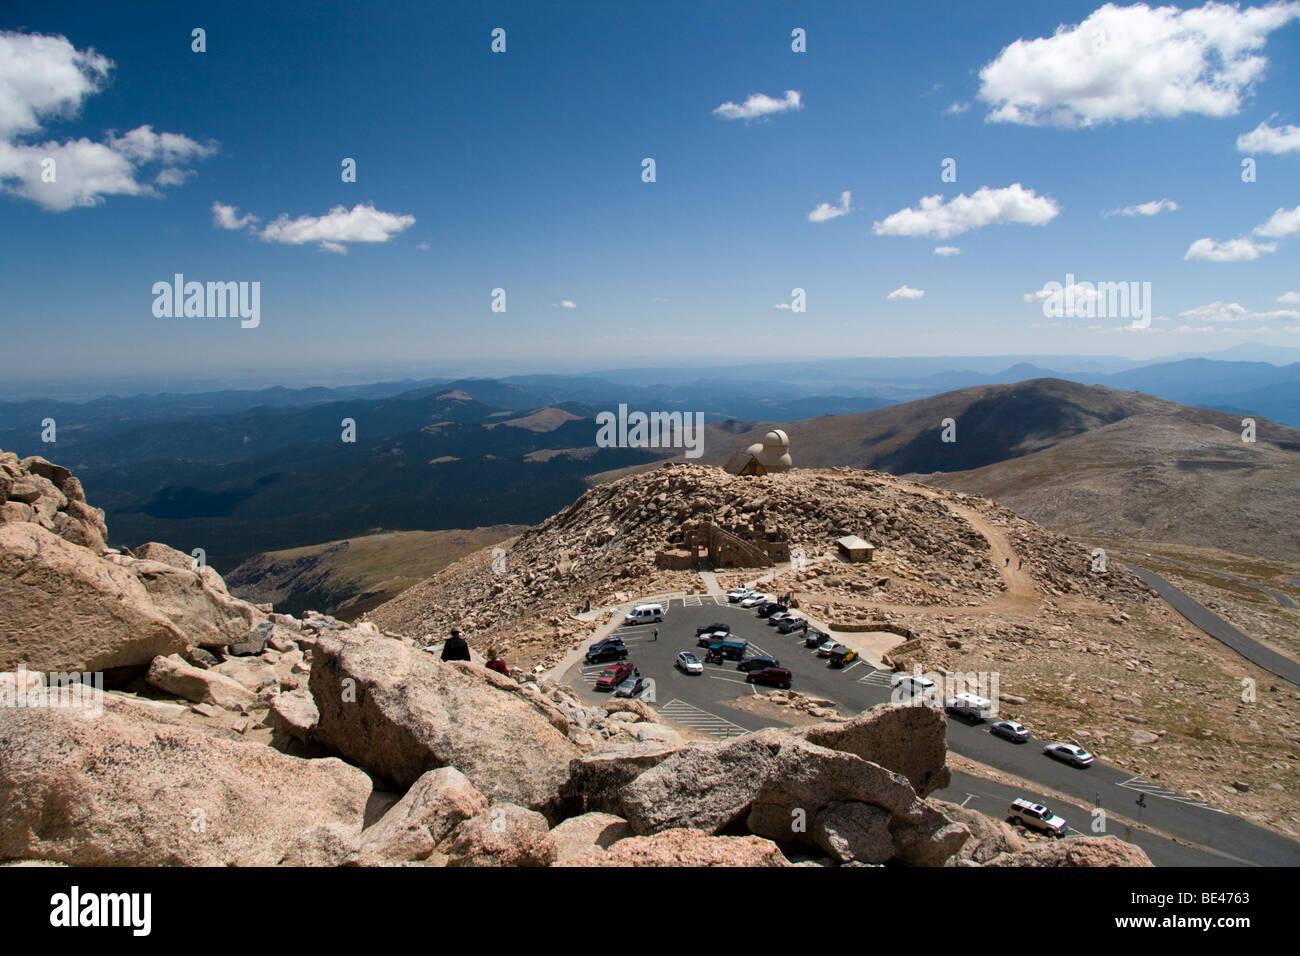 View of the Mount Evans car park, parking lot, Colorado, USA - Stock Image